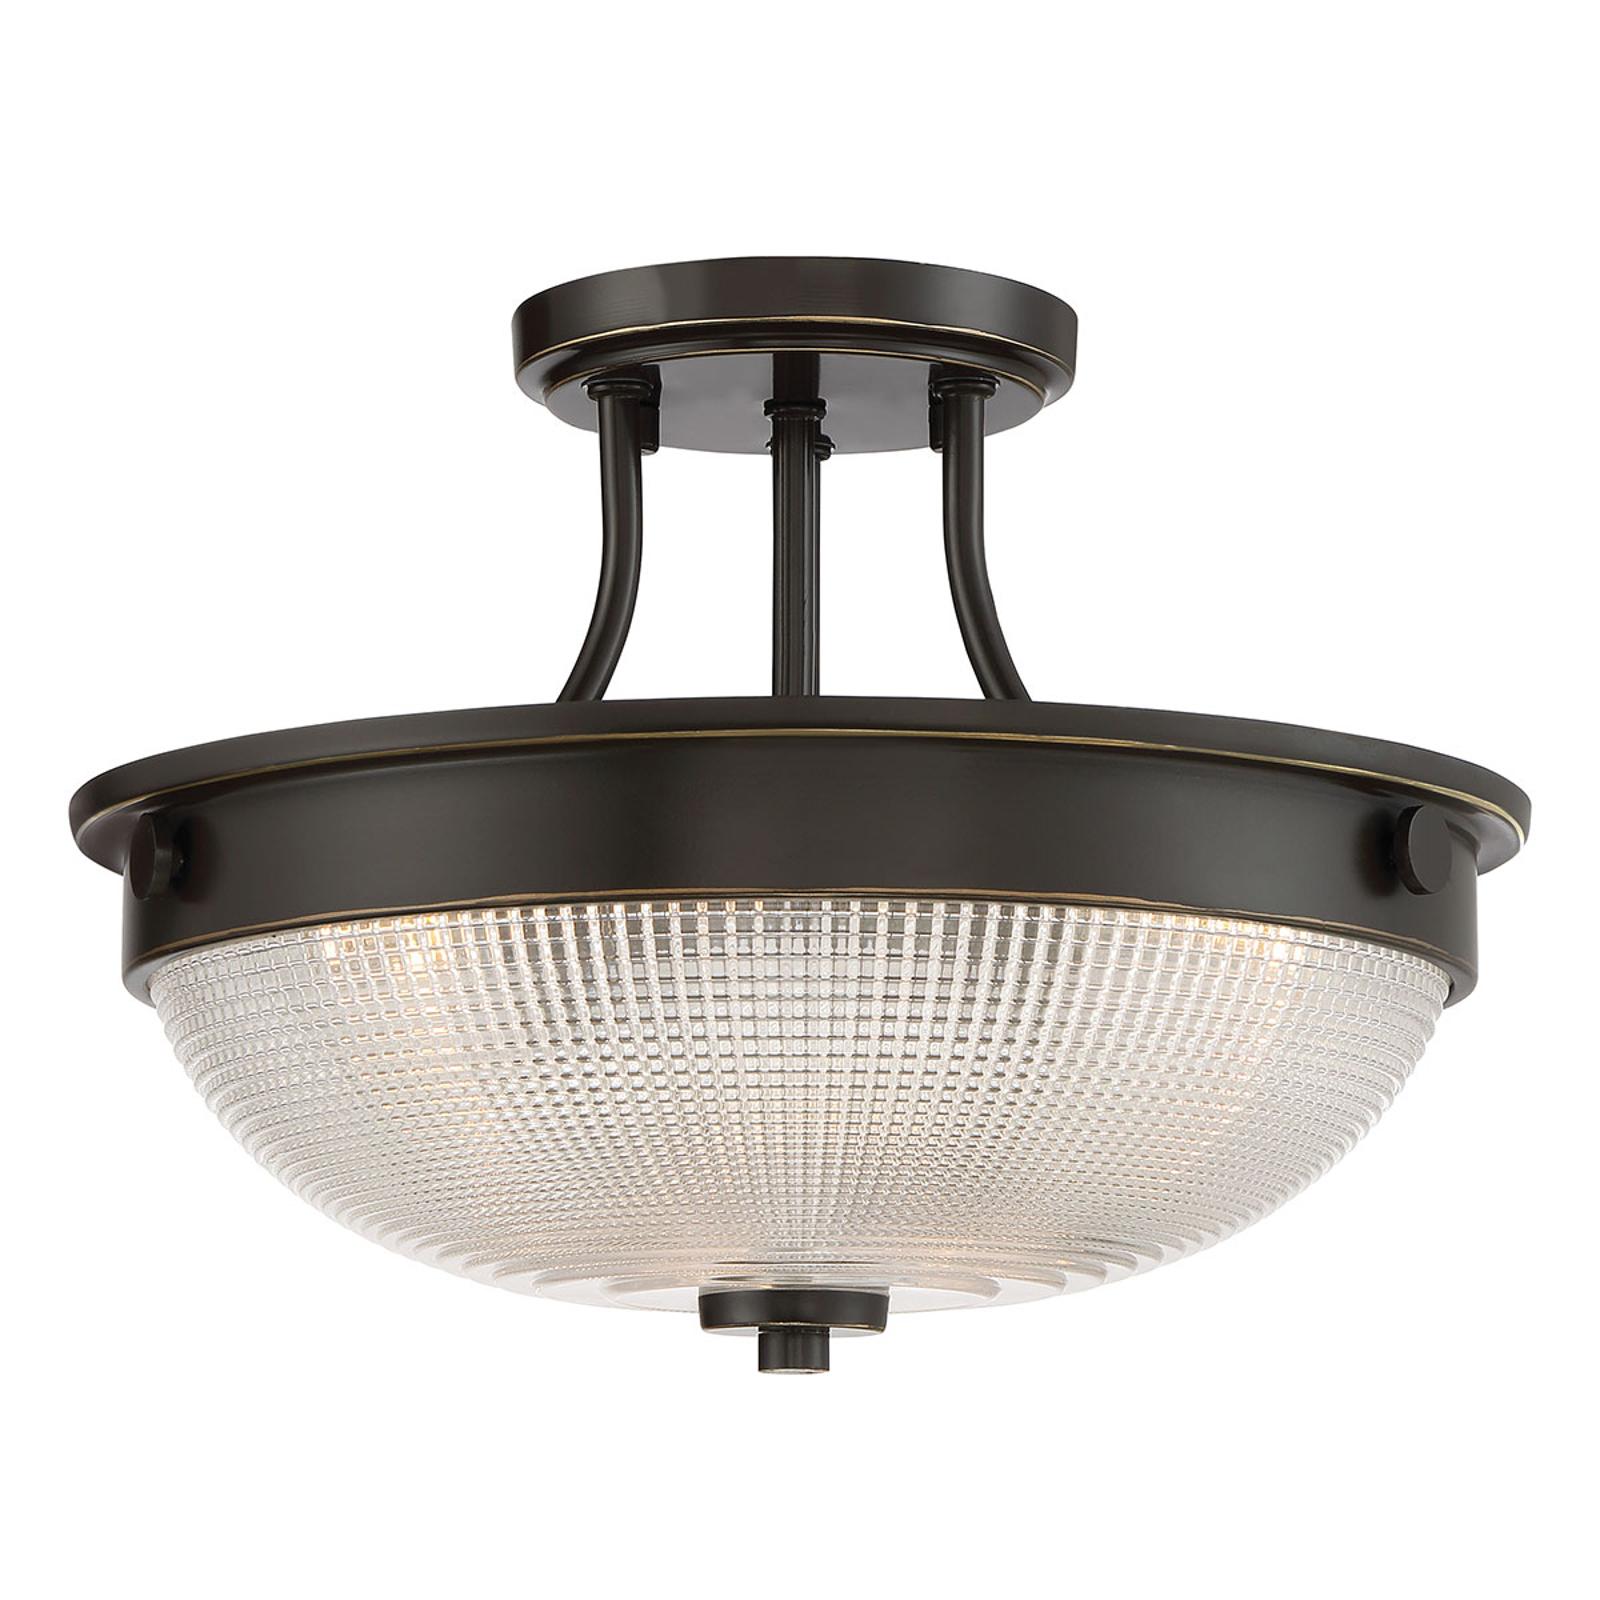 Glas-plafondlamp Mantle met bronsfinish